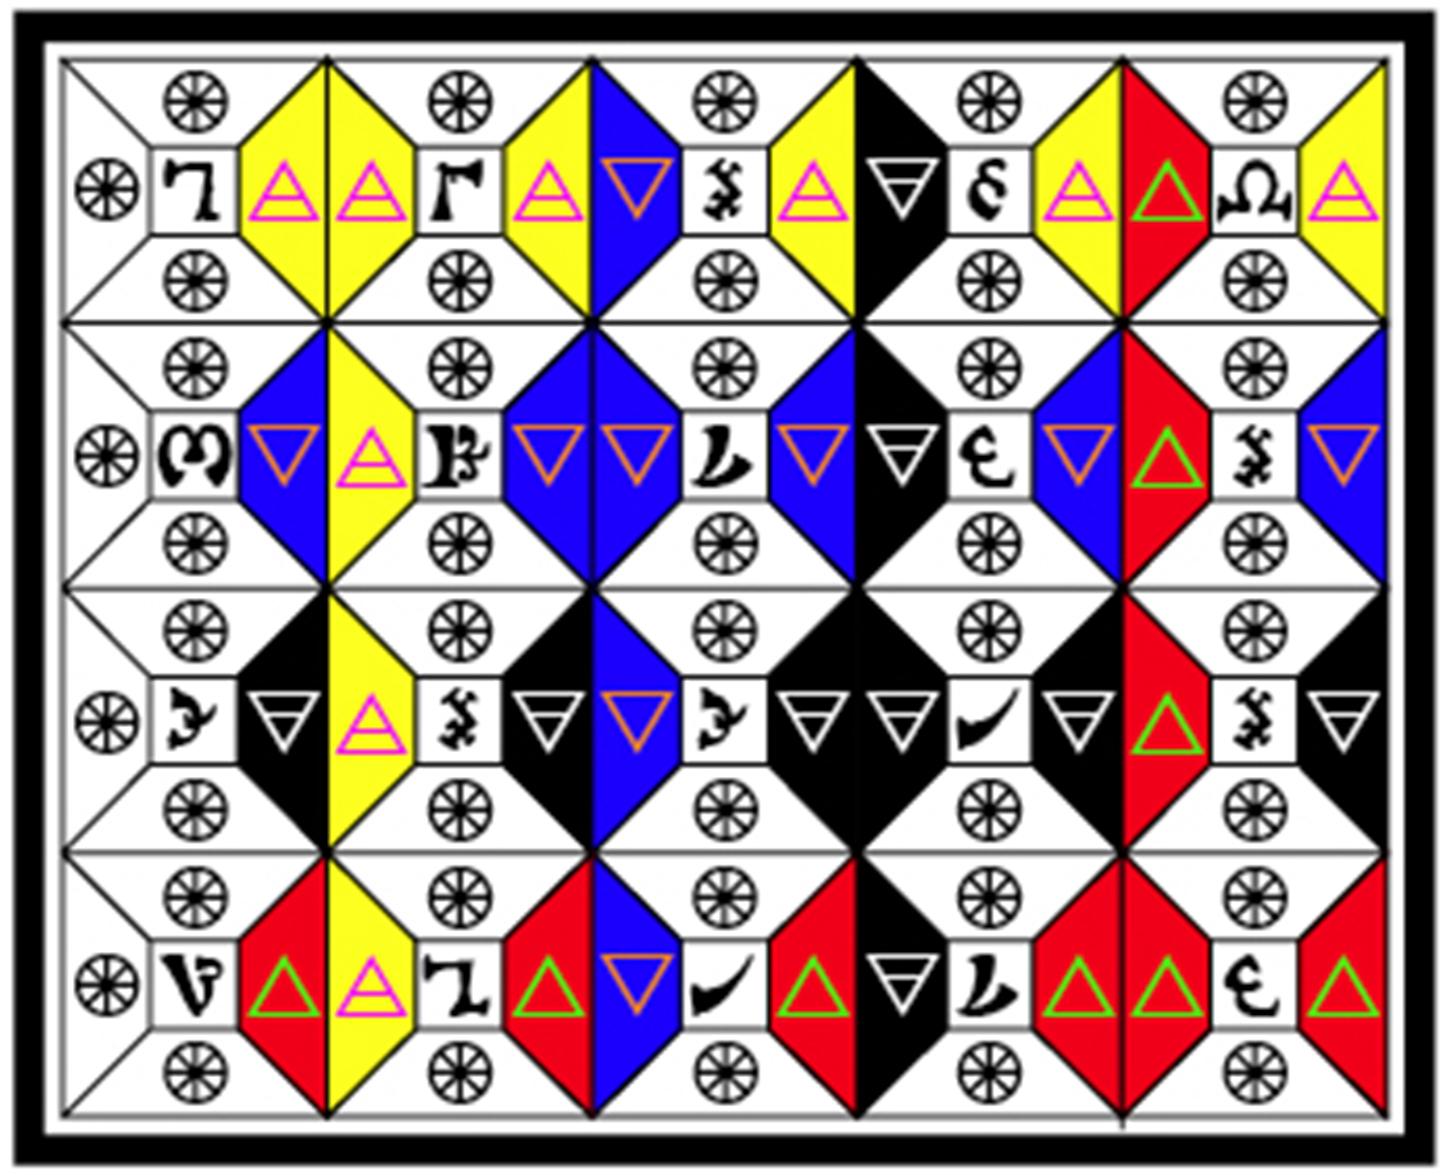 plate_8_black_cross%20300dpi.jpg